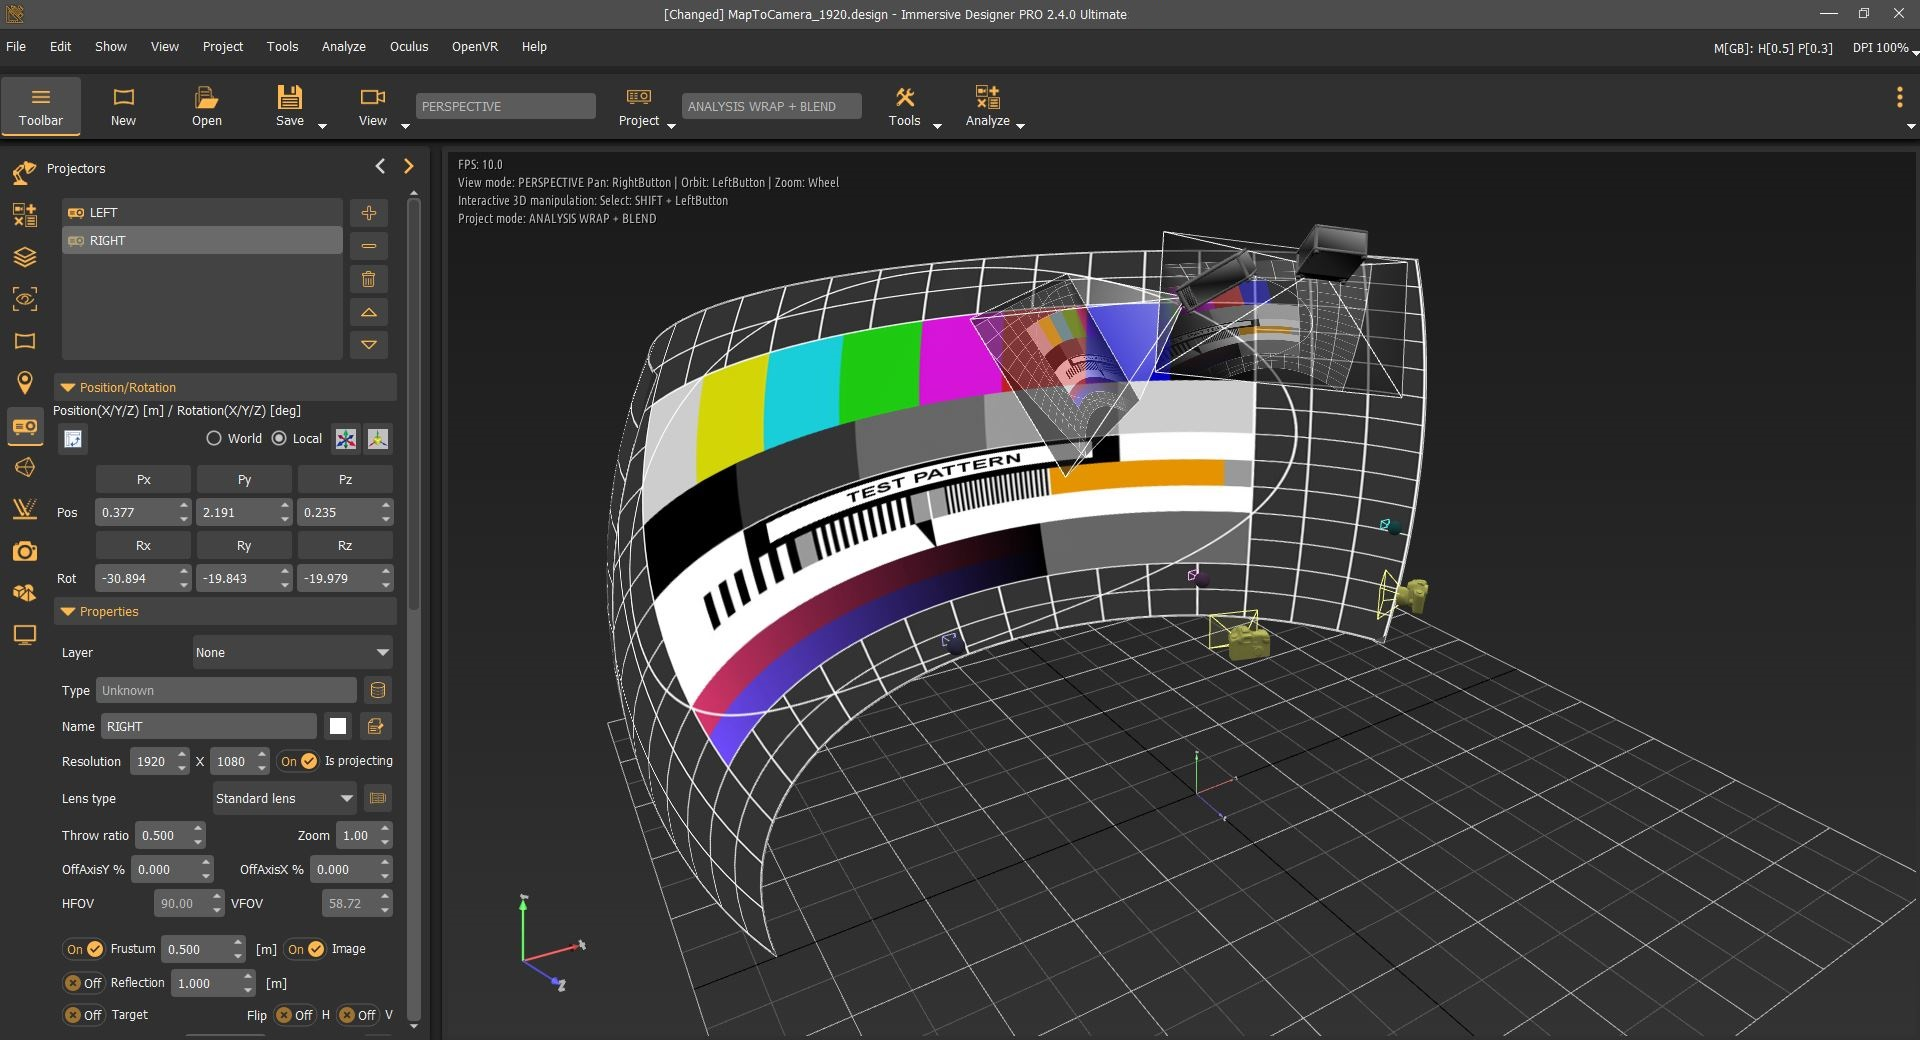 Immersive Designer PRO v2.4.1